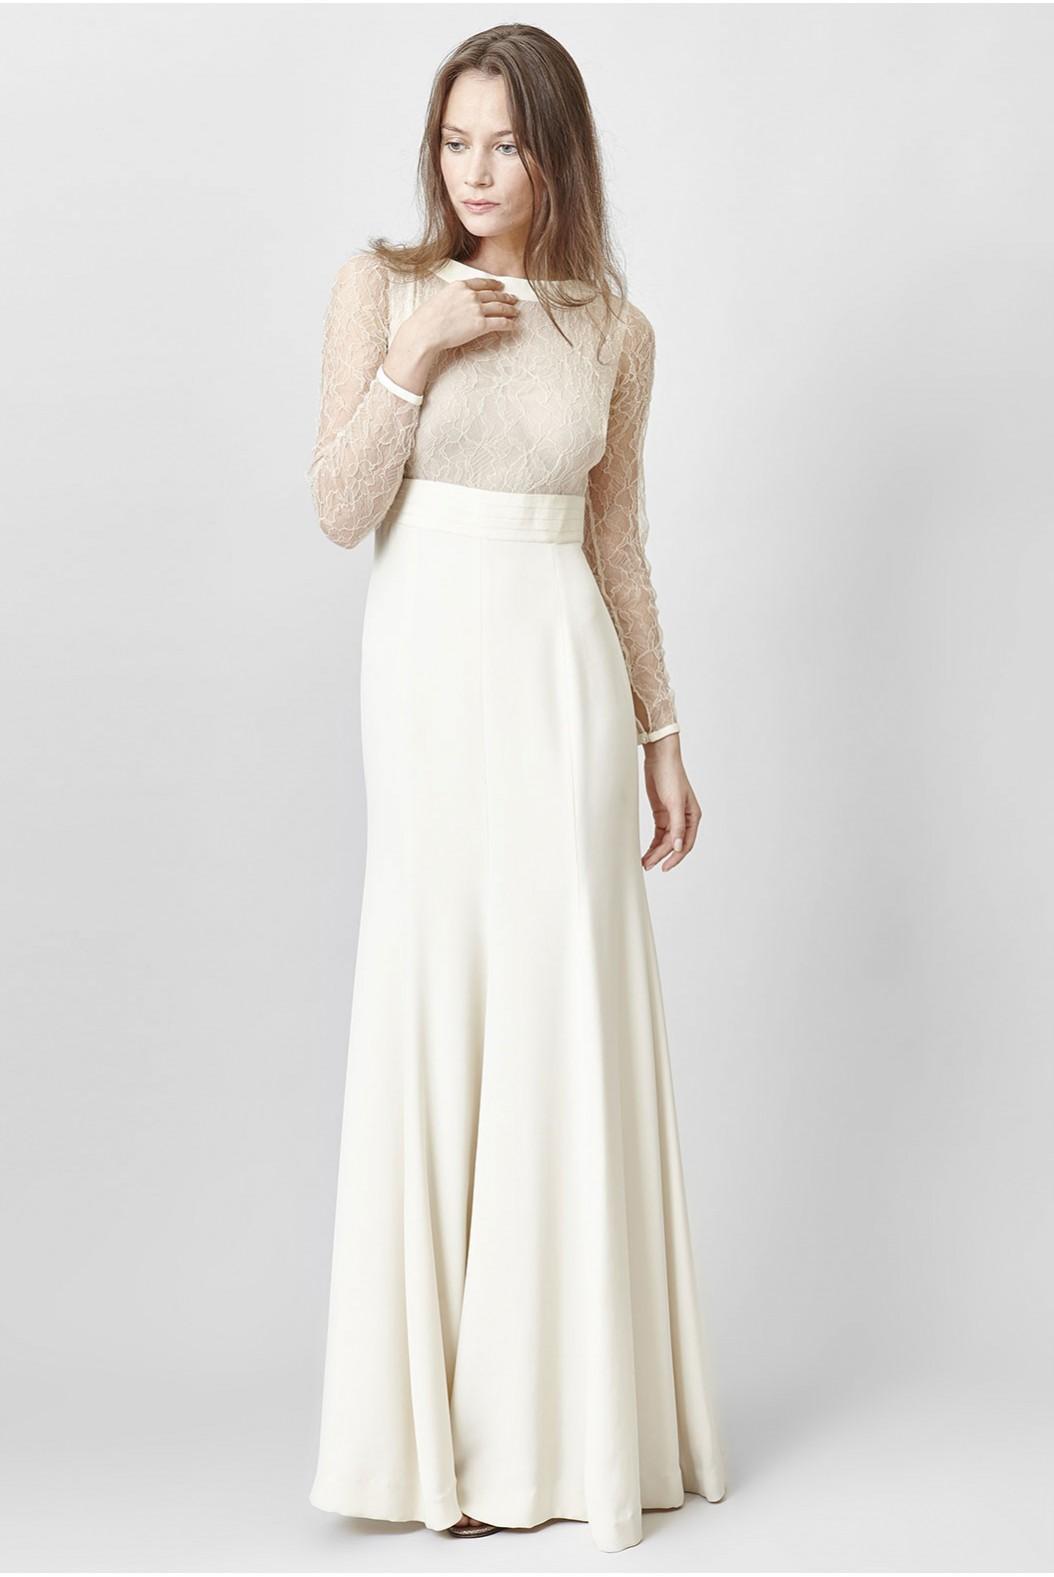 Robe élégante : choisir son style